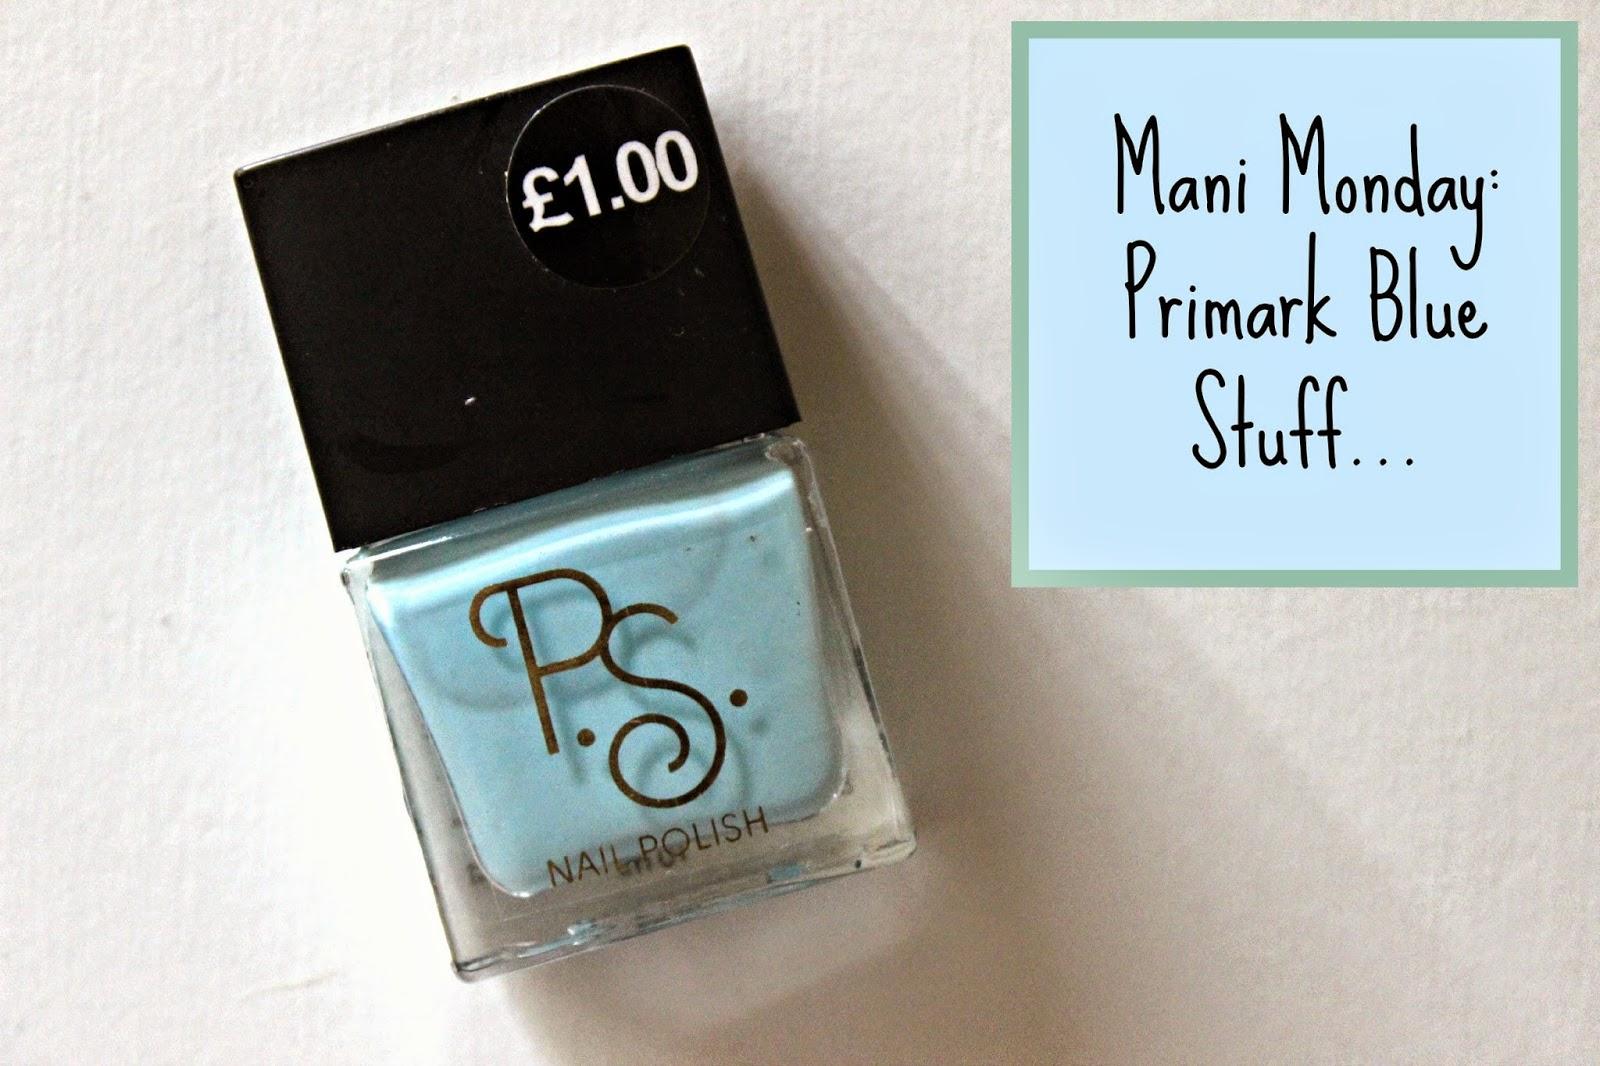 Mani Monday: Primark Blue Stuff…